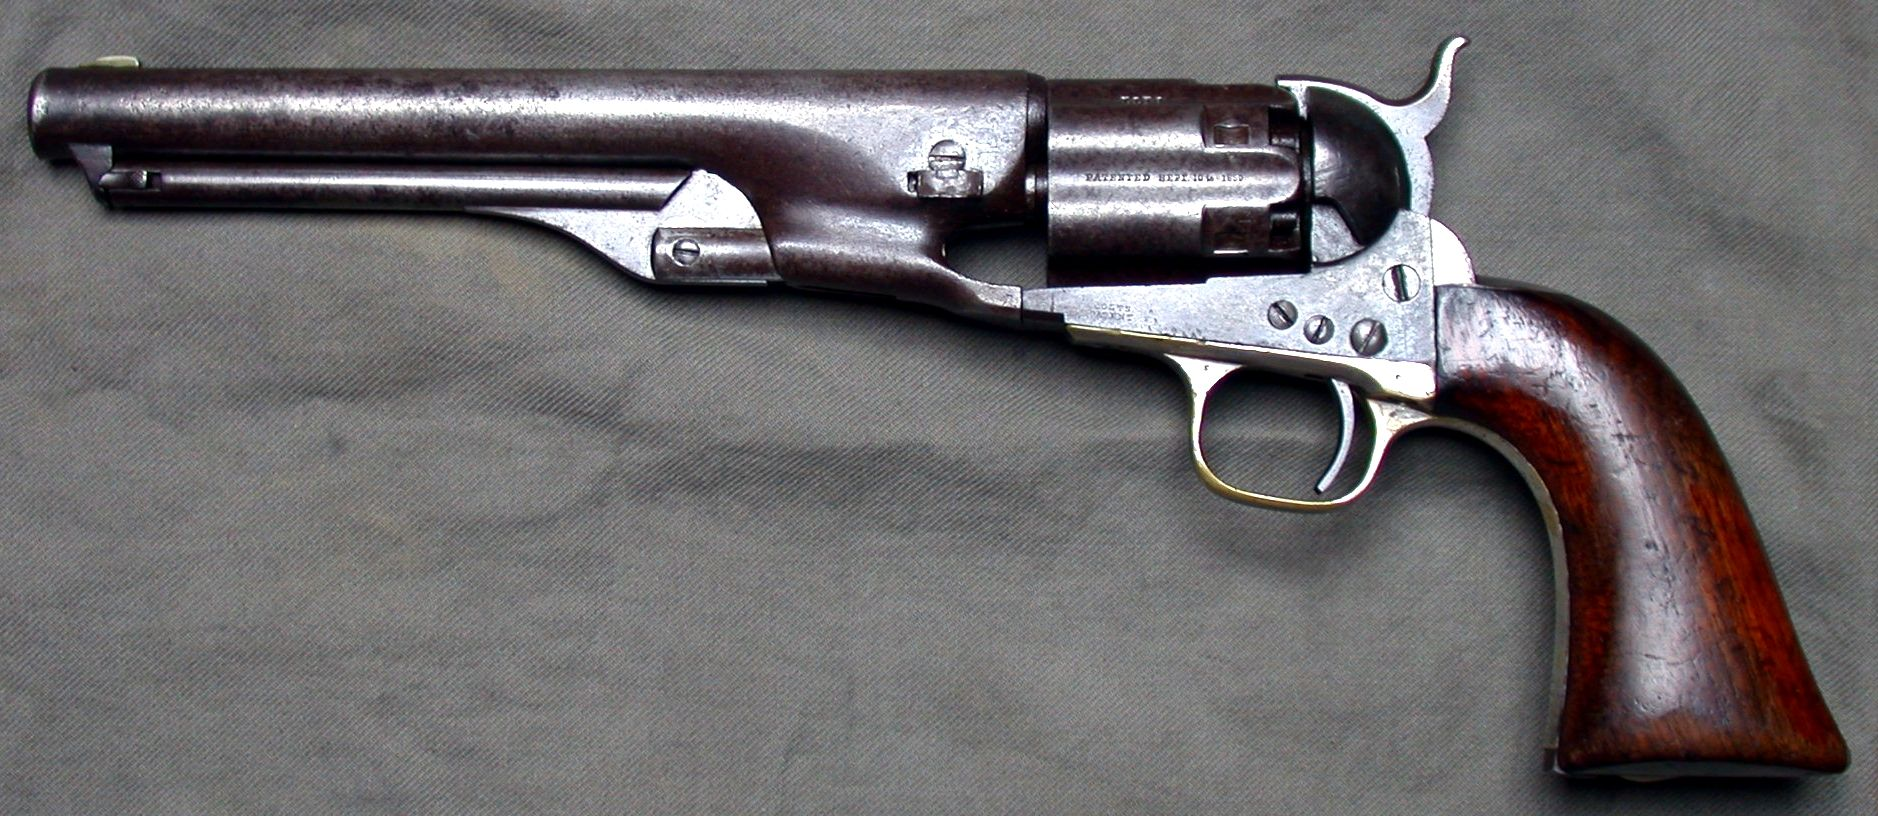 The Colt Python: The Best Revolver Ever Made?